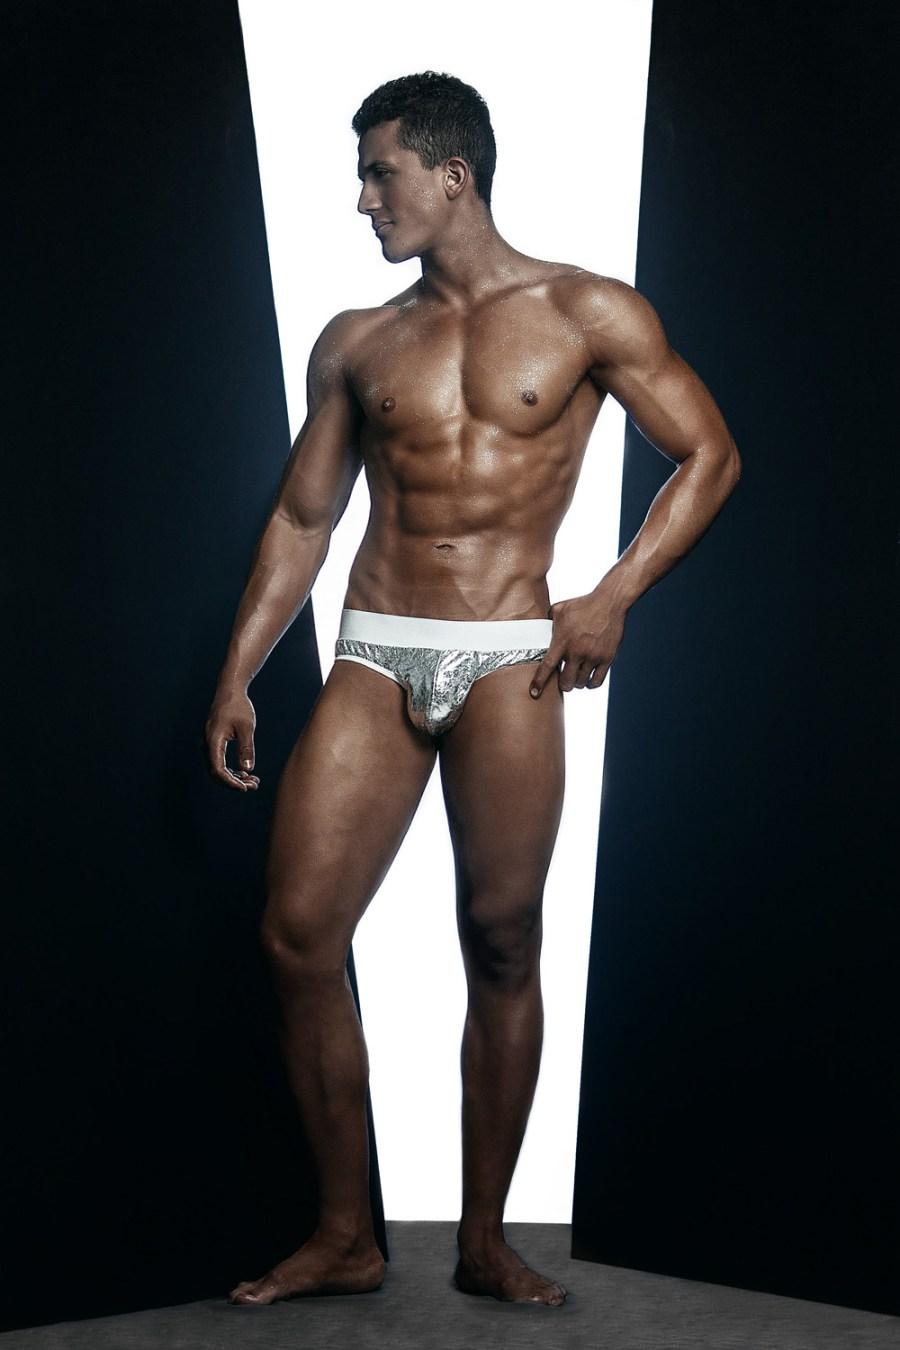 Erik Ramos by Chris Femat for Fashionably Male417